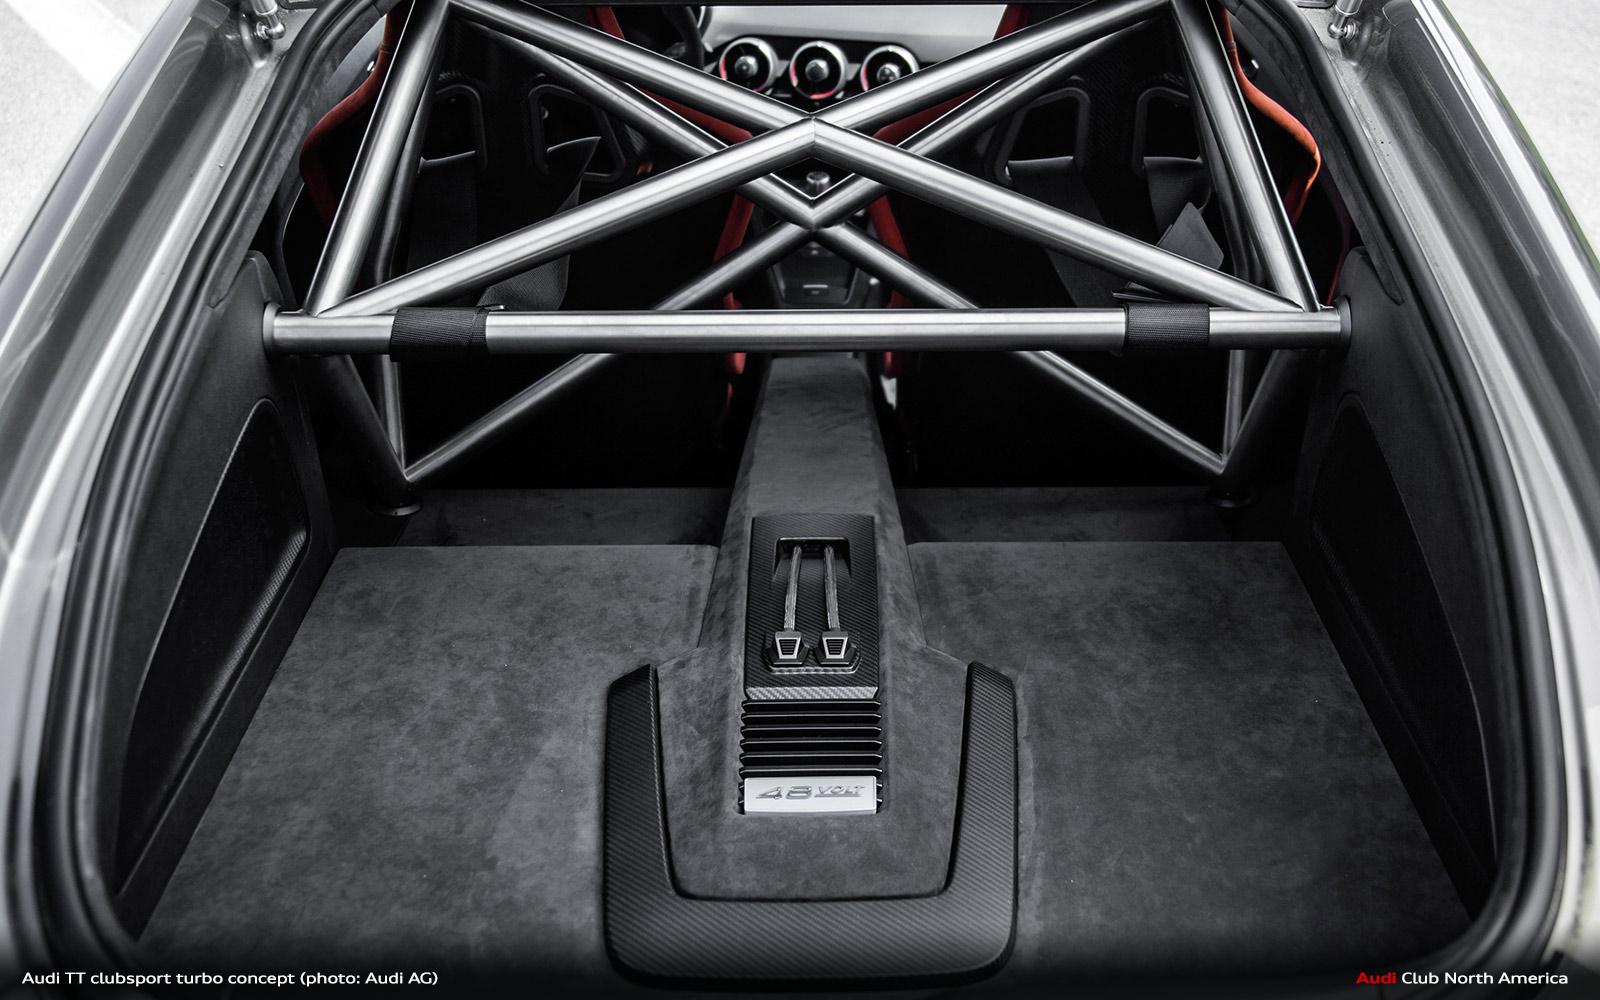 VW Group Shares 48-Volt Plans at Vienna Motor Symposium